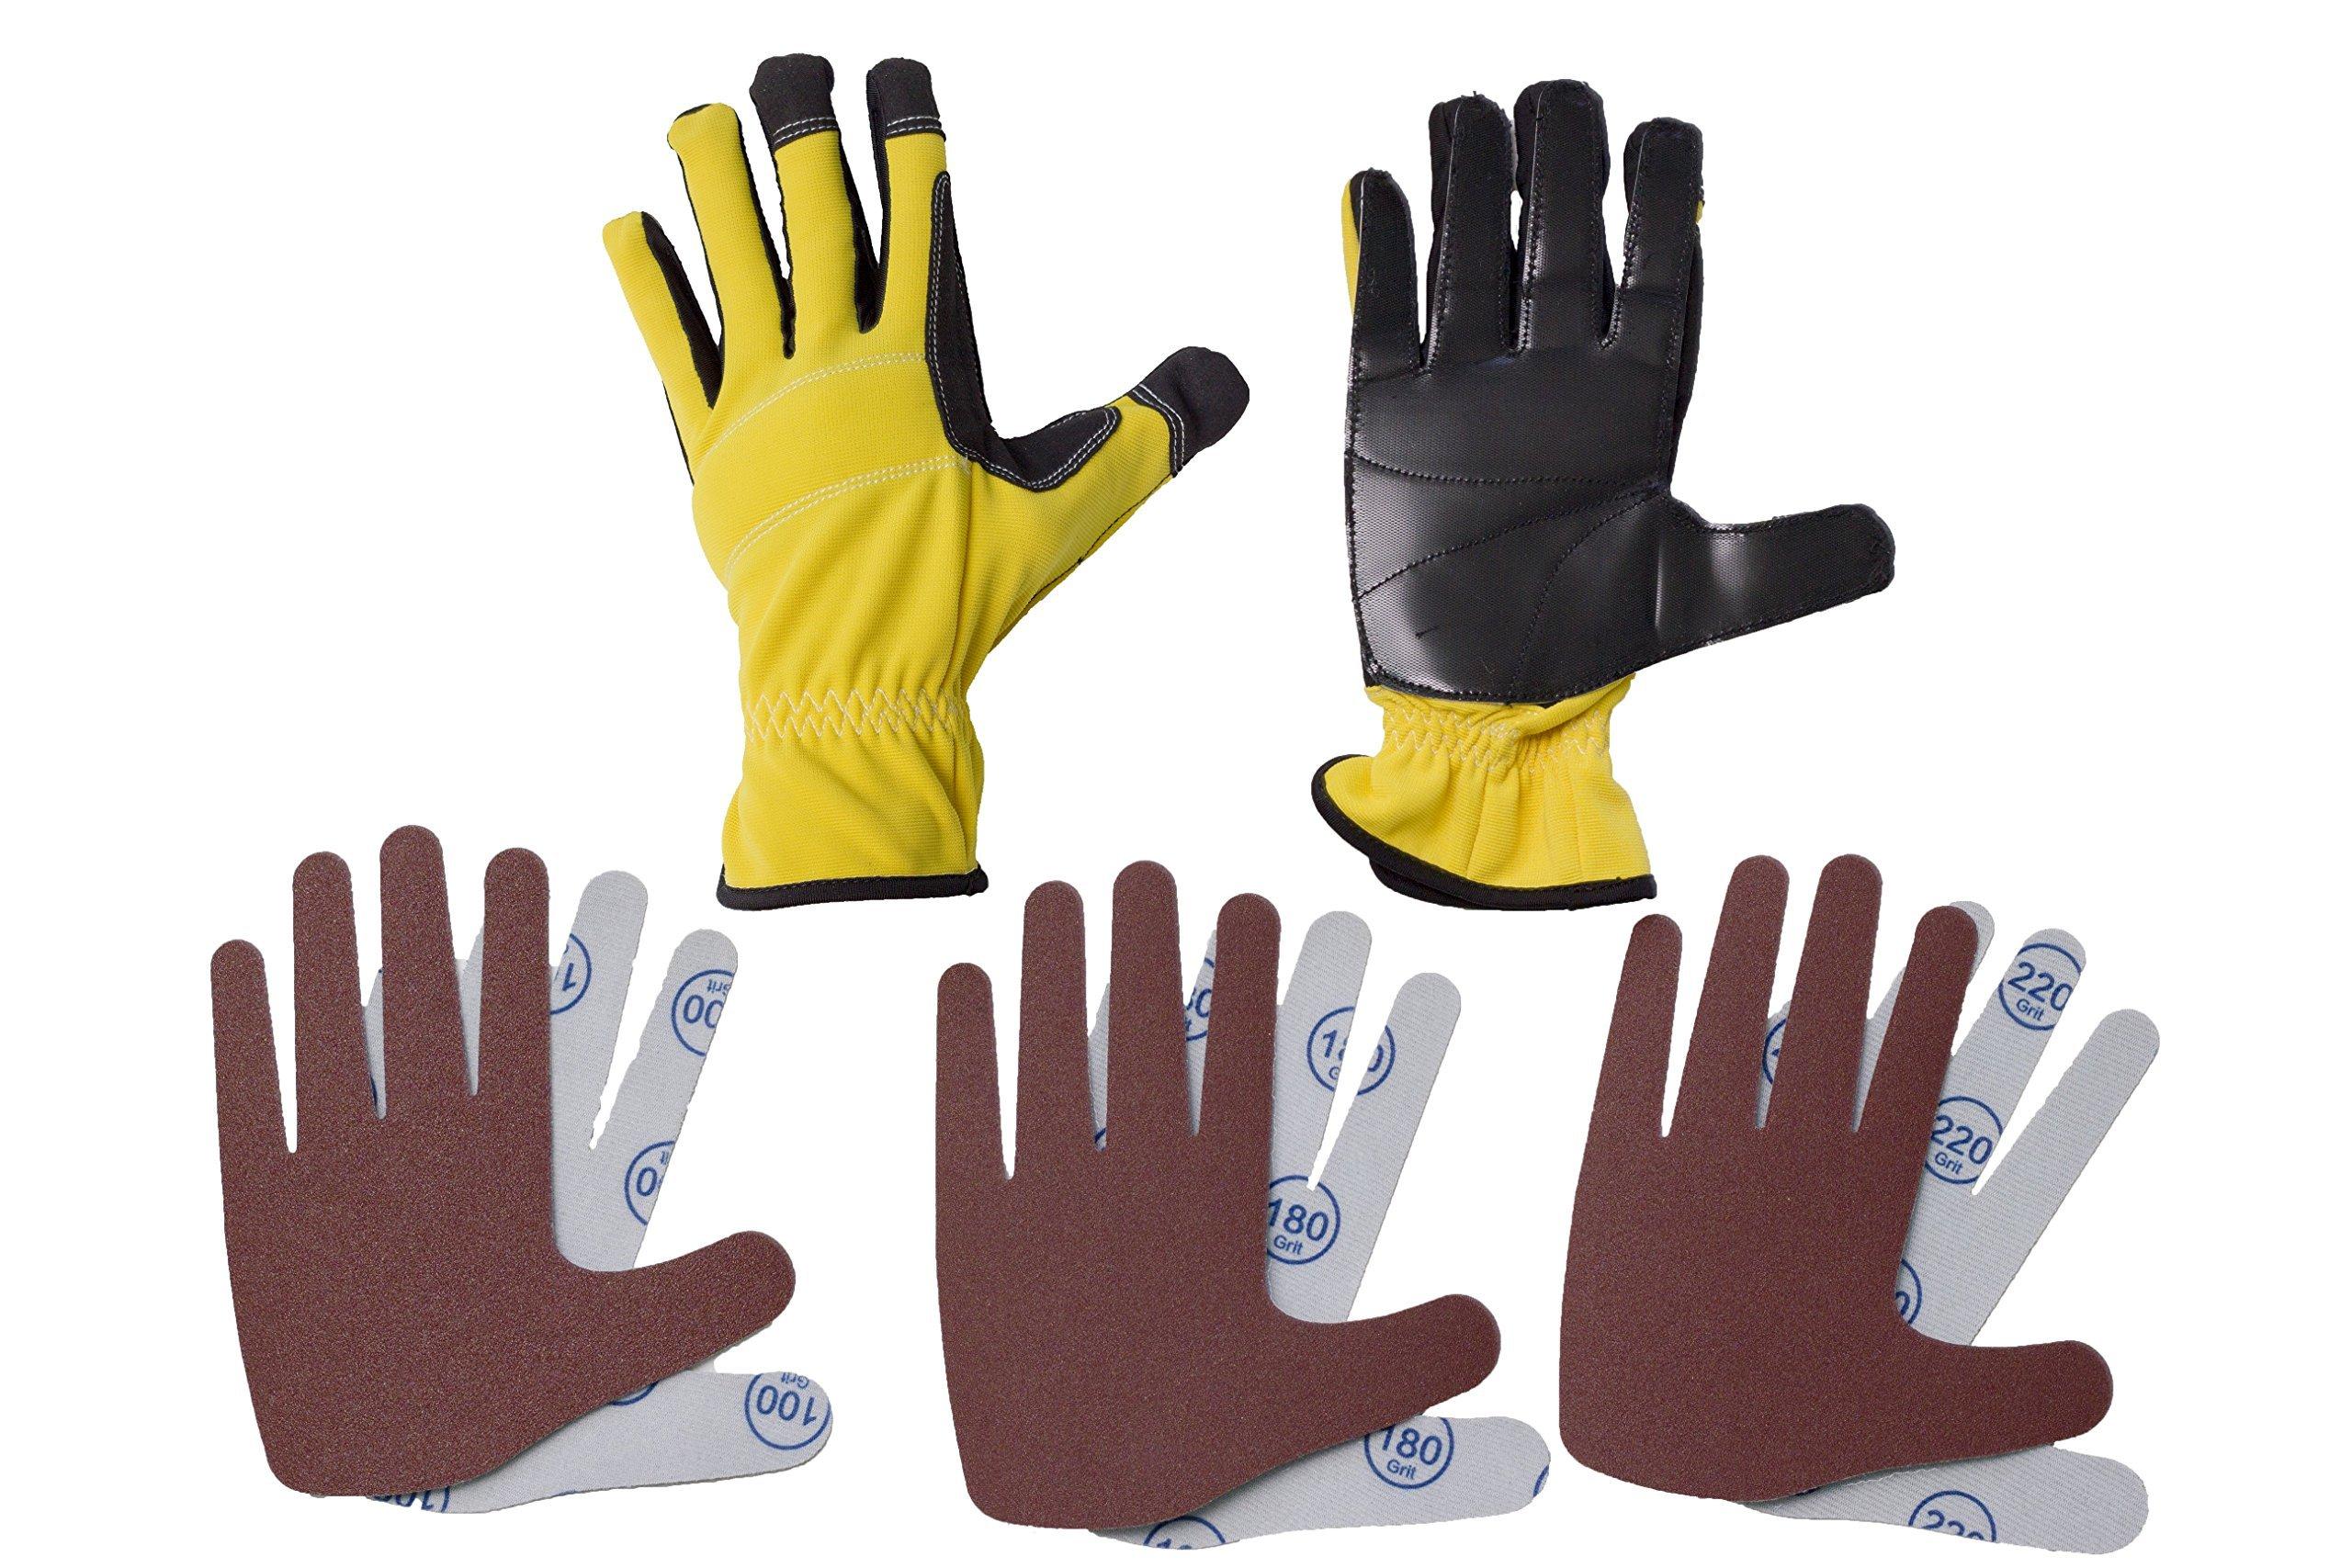 Peel & Stick Sanding Duel Hand Glove Set (Large) by Peel & Stick Sanding Glove